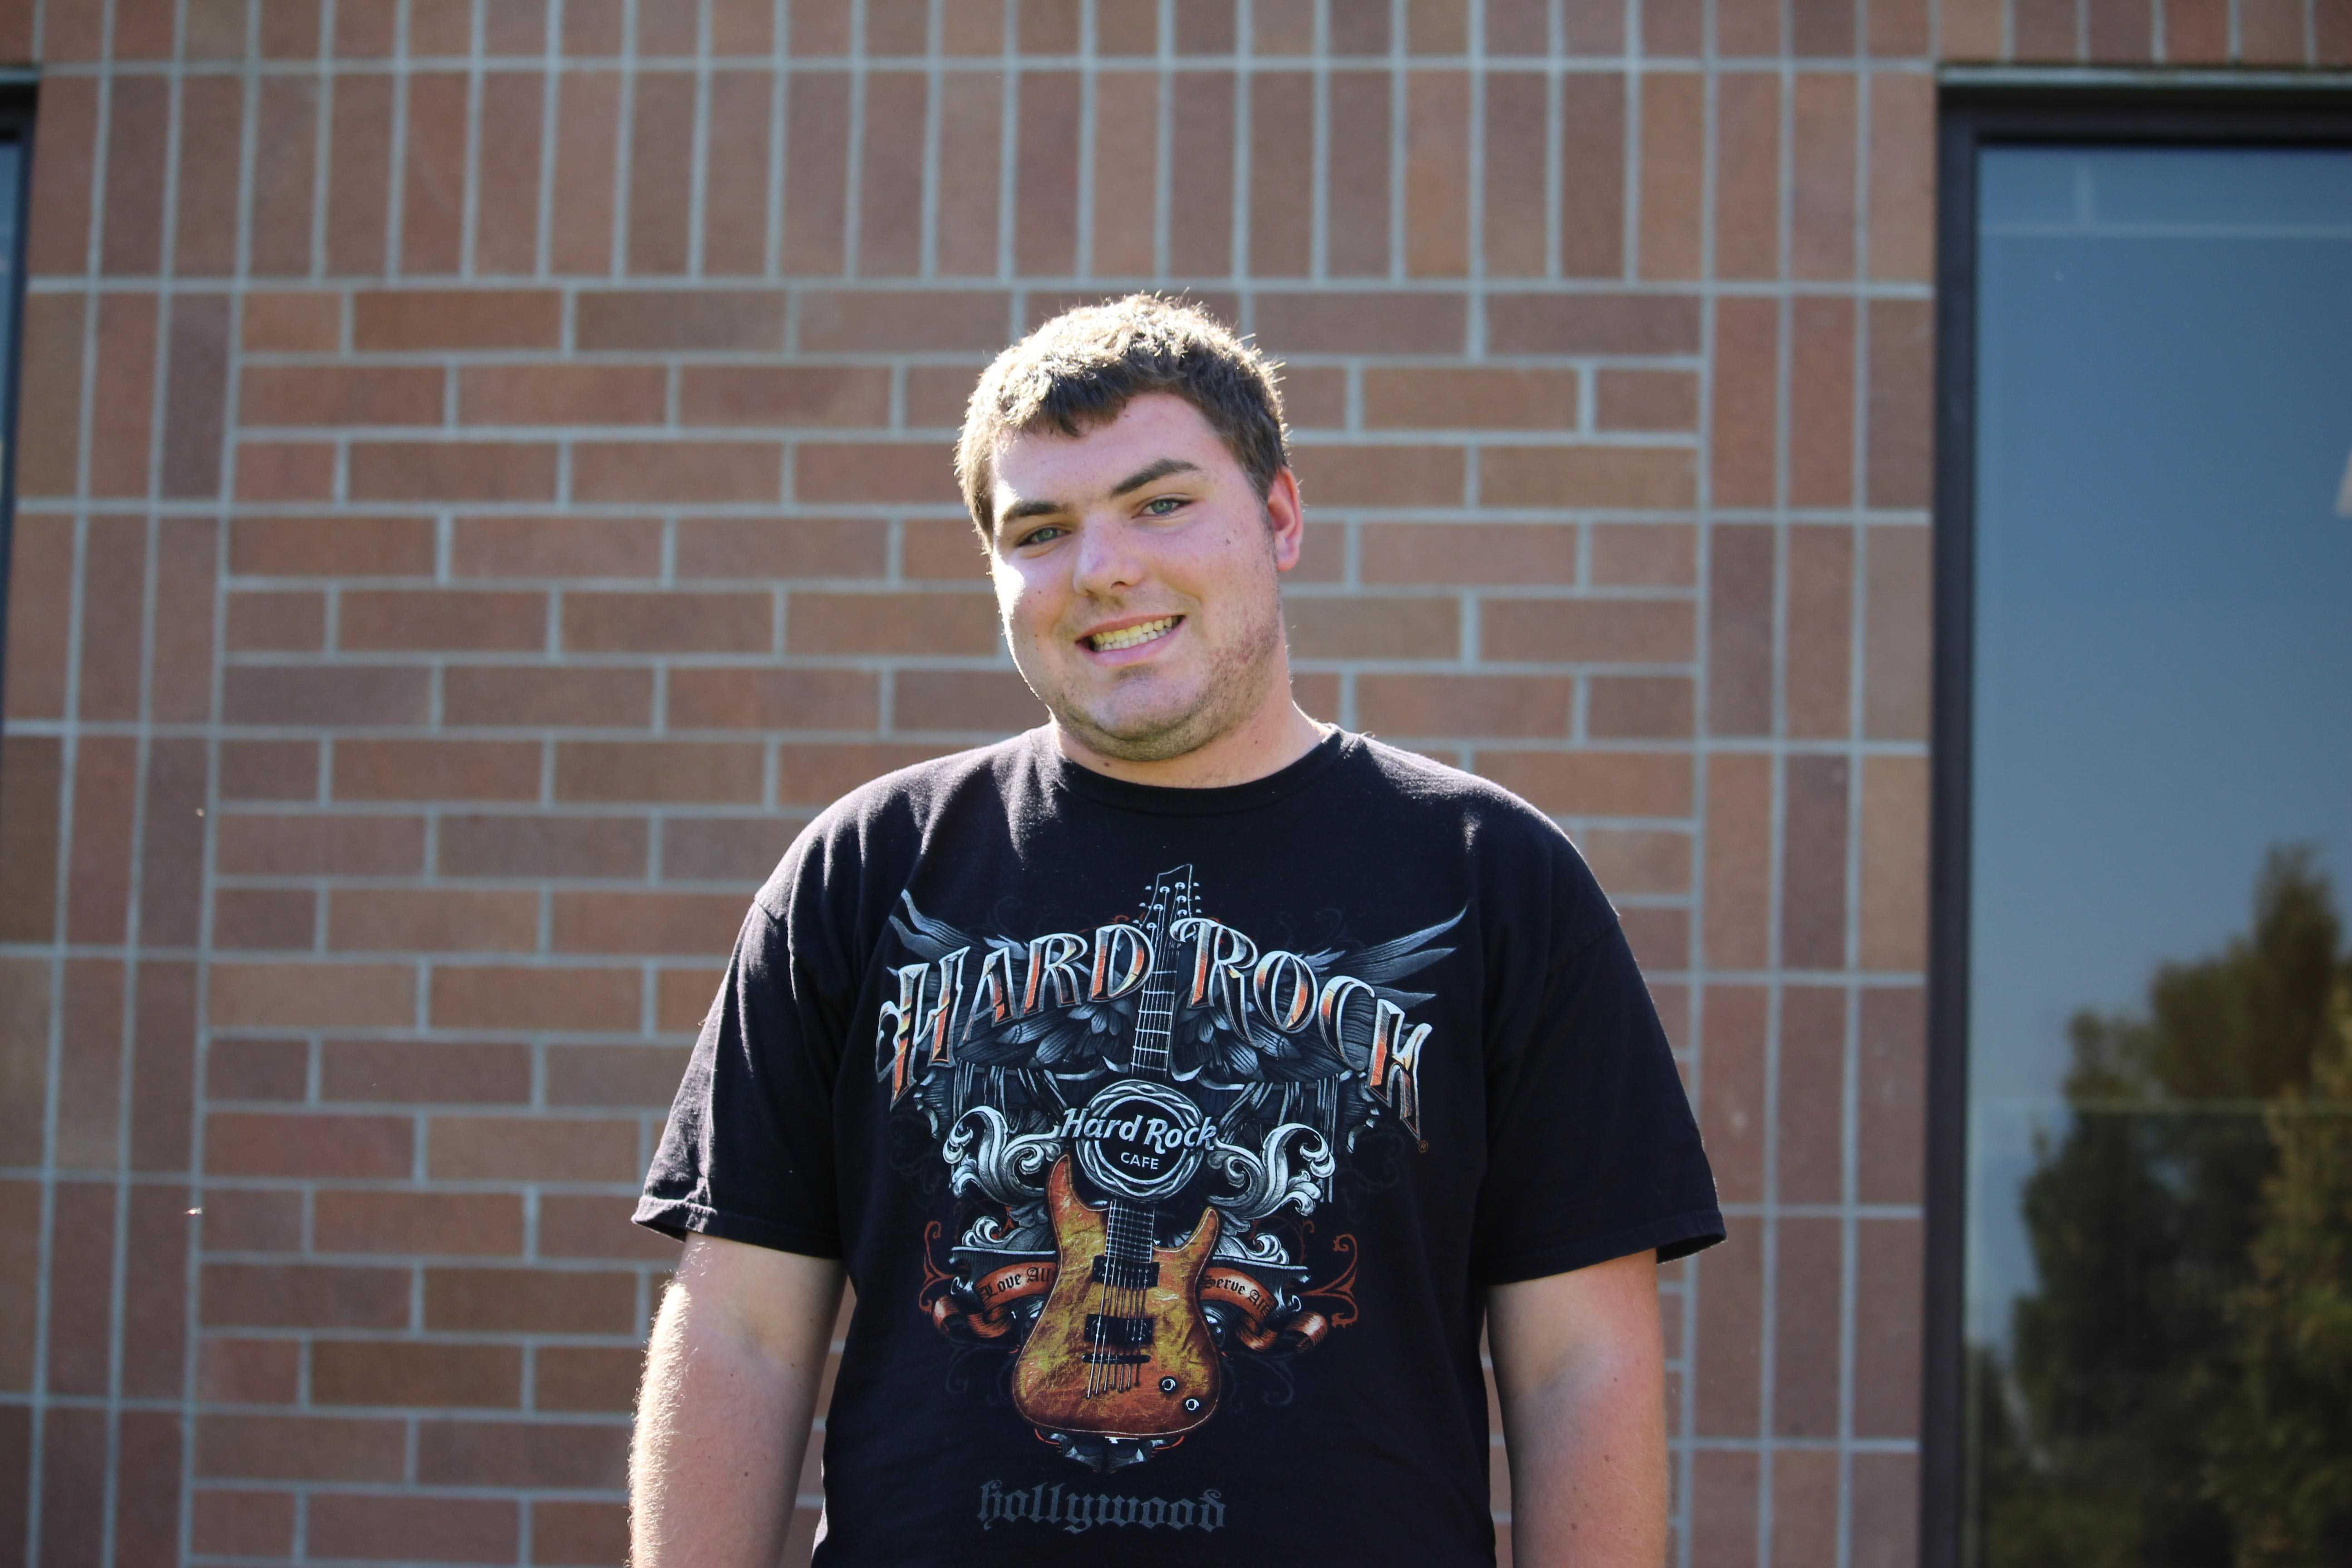 Staff Reporter Troy Price